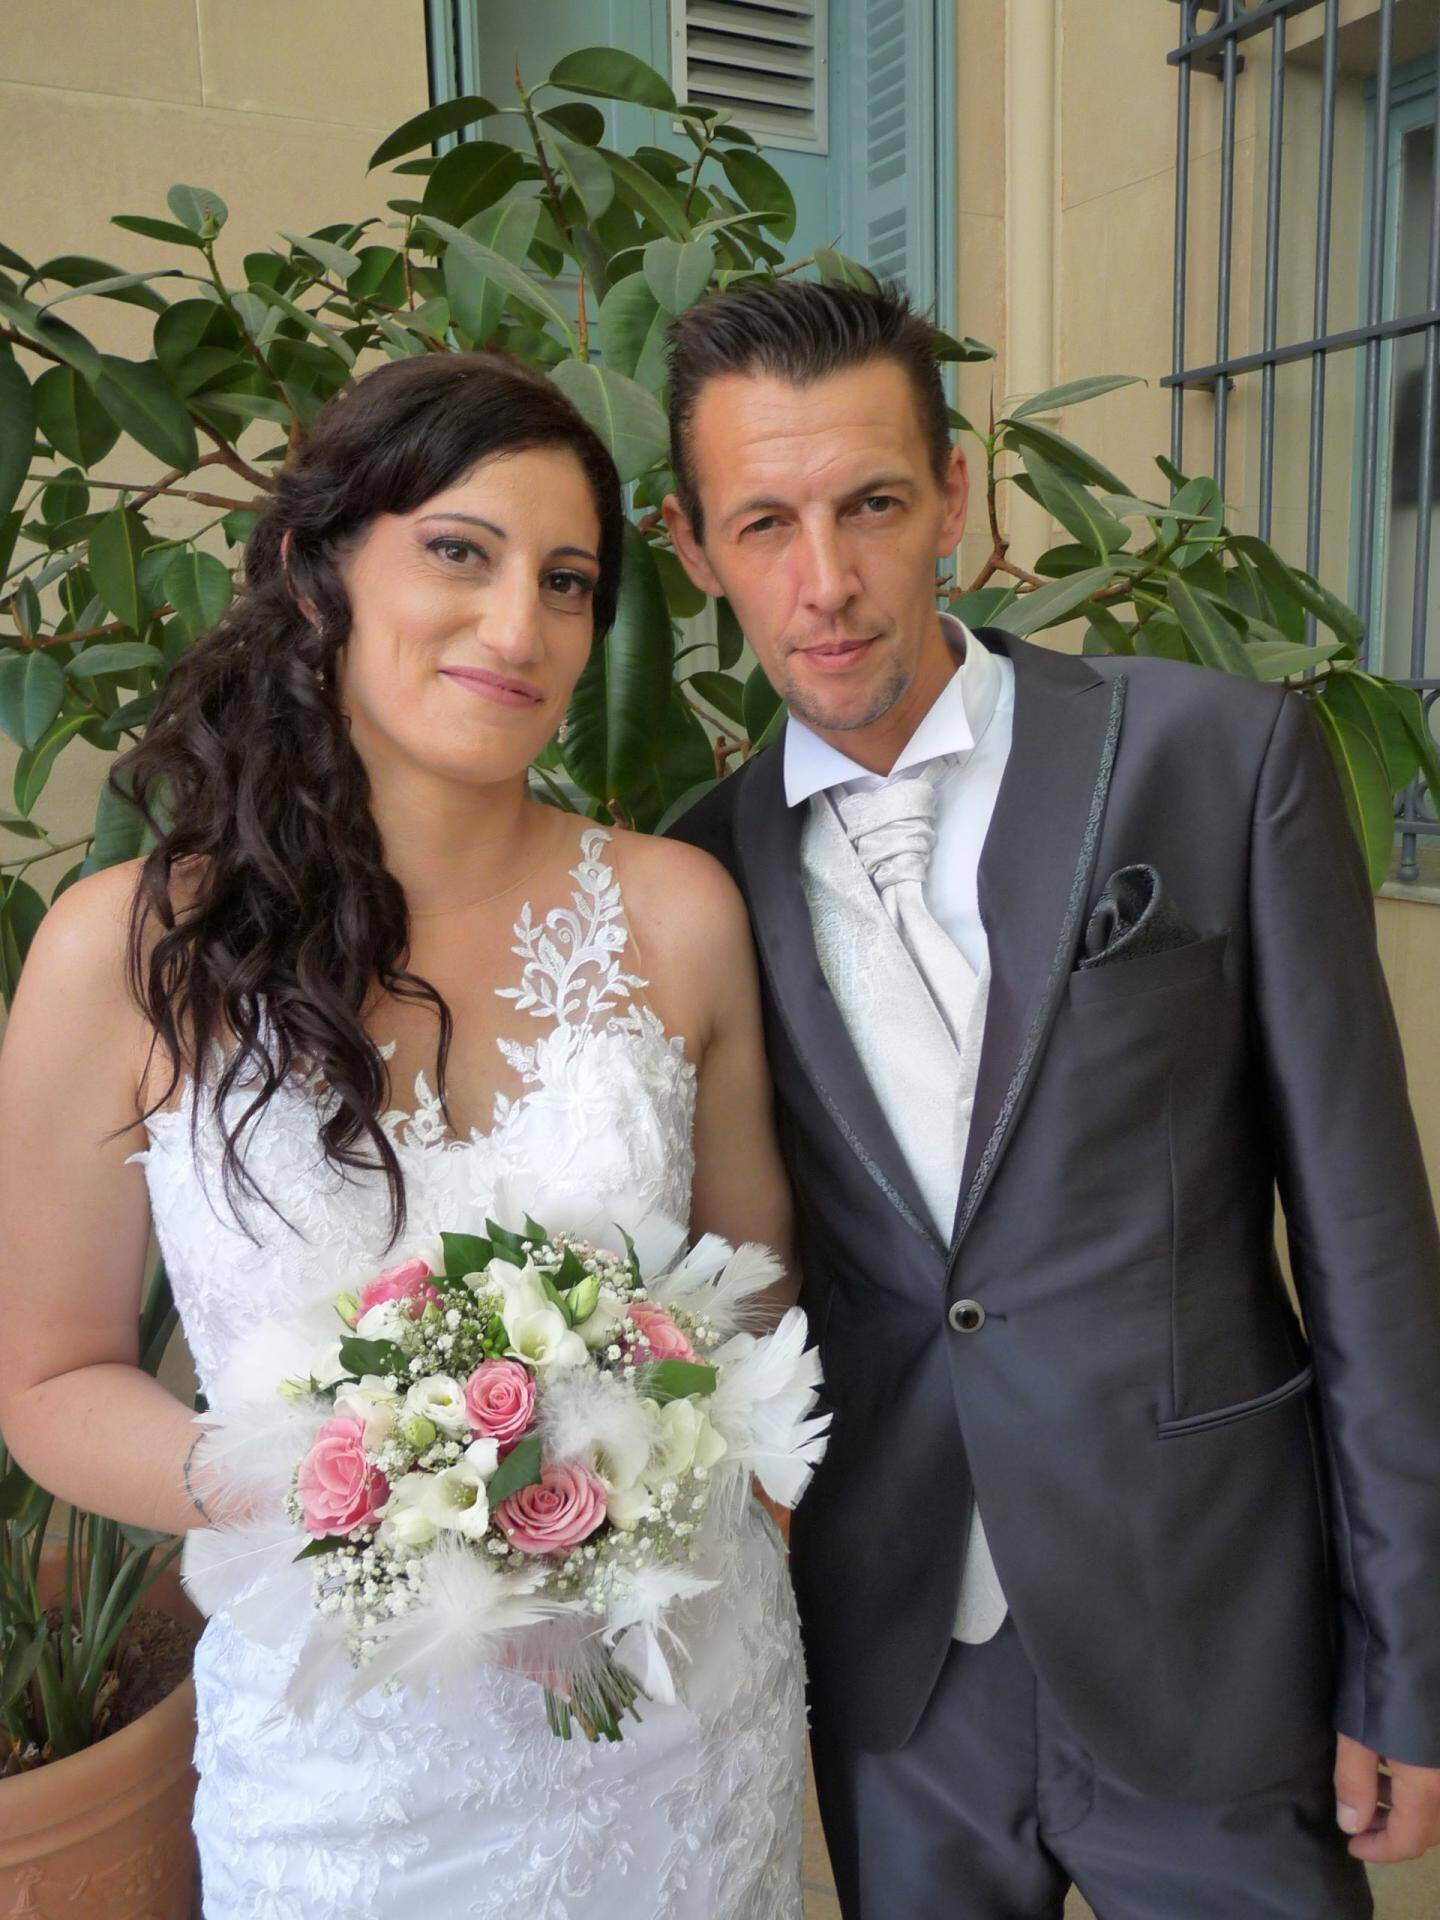 Audrey Benestang, aide-soignante, et Ludovic Sobol, chauffeur-livreur.